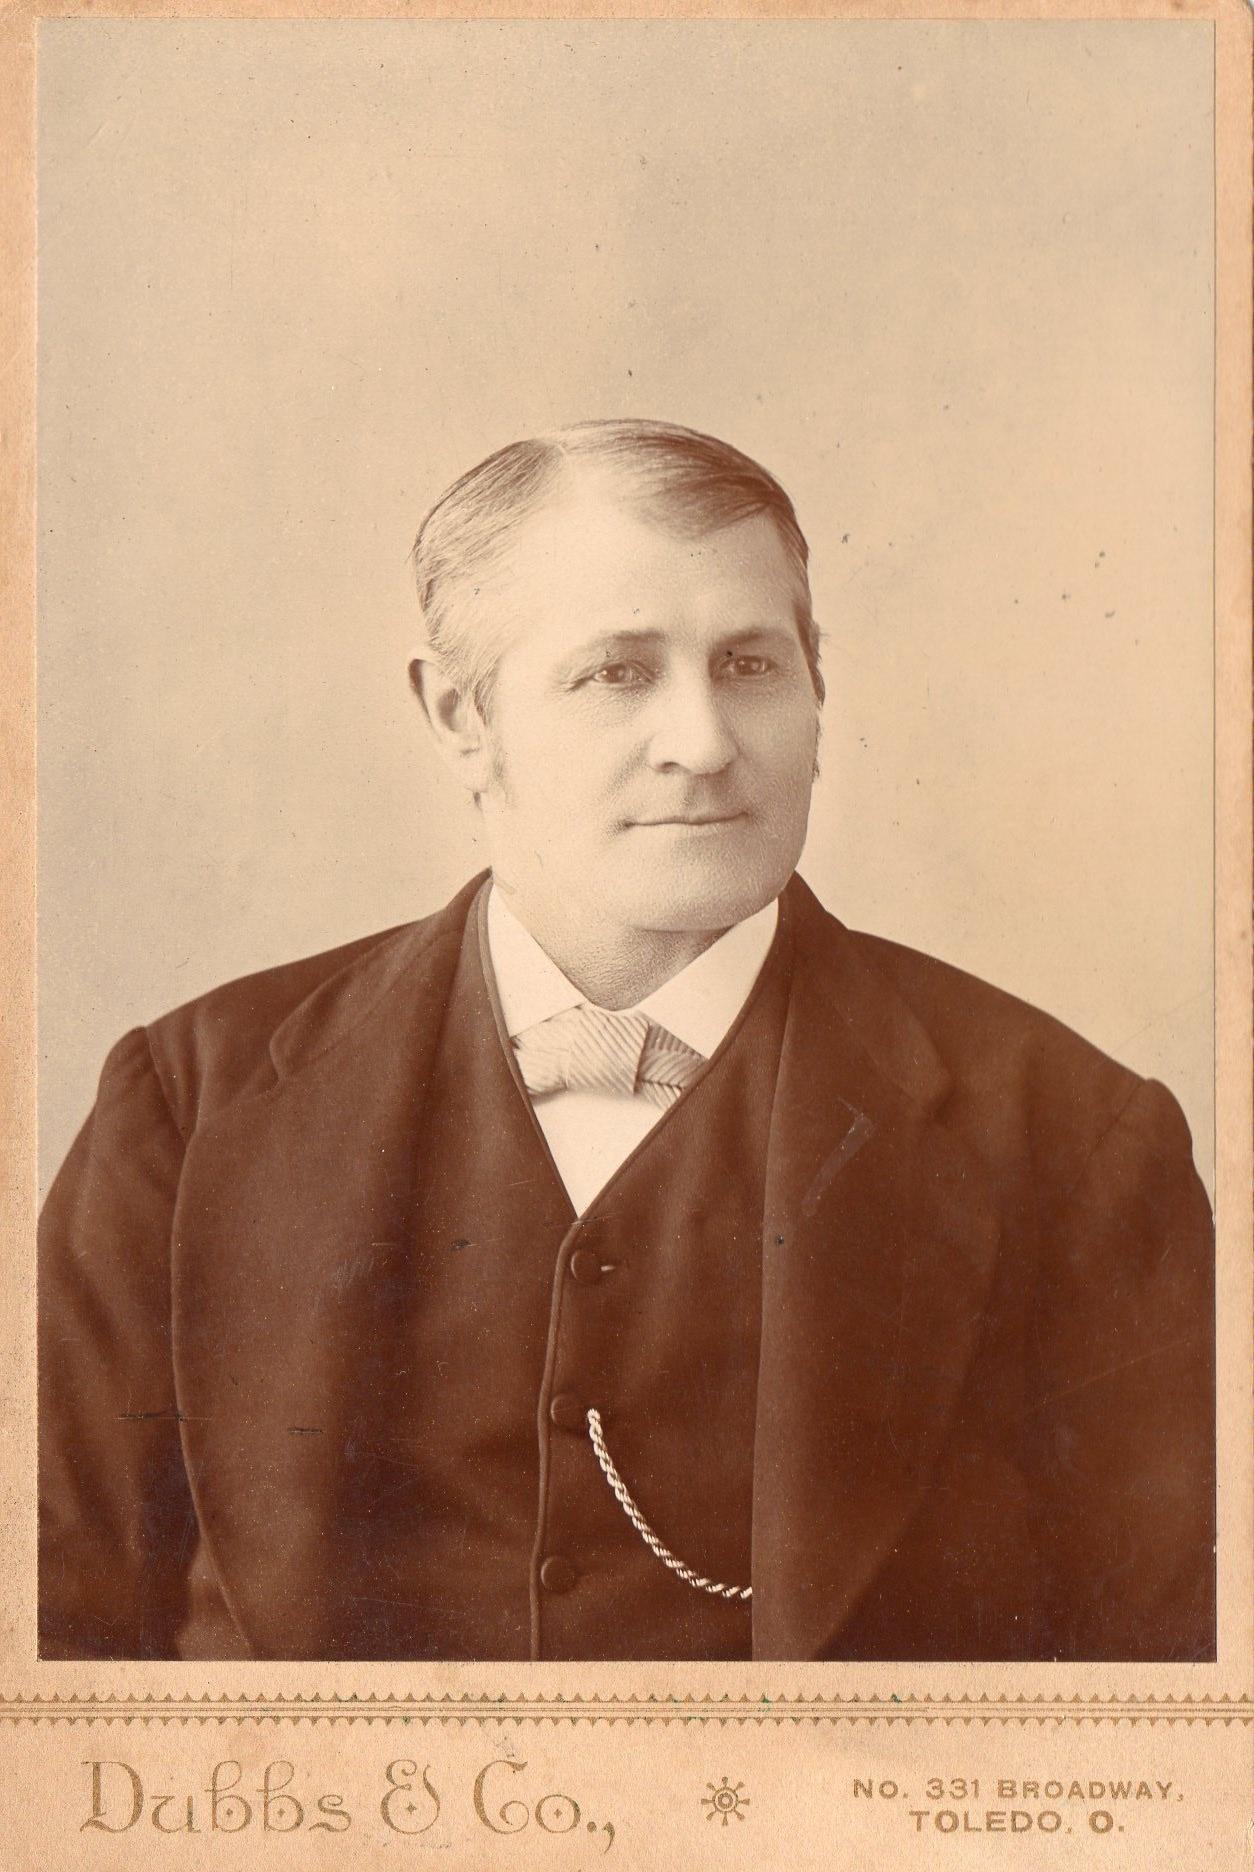 John C Henig